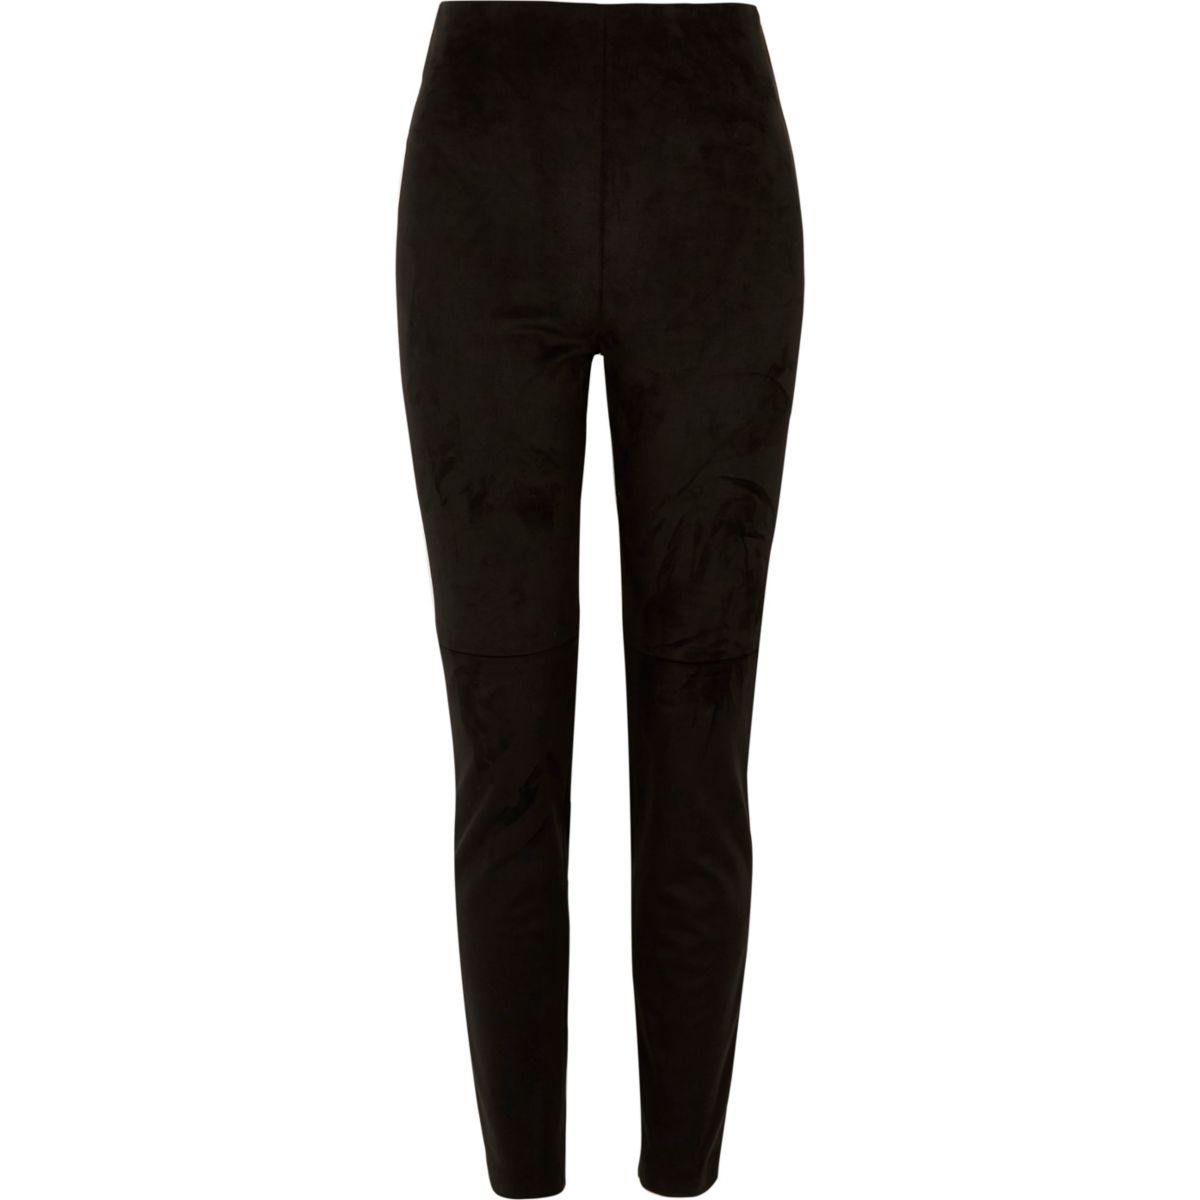 Black moleskin skinny trousers